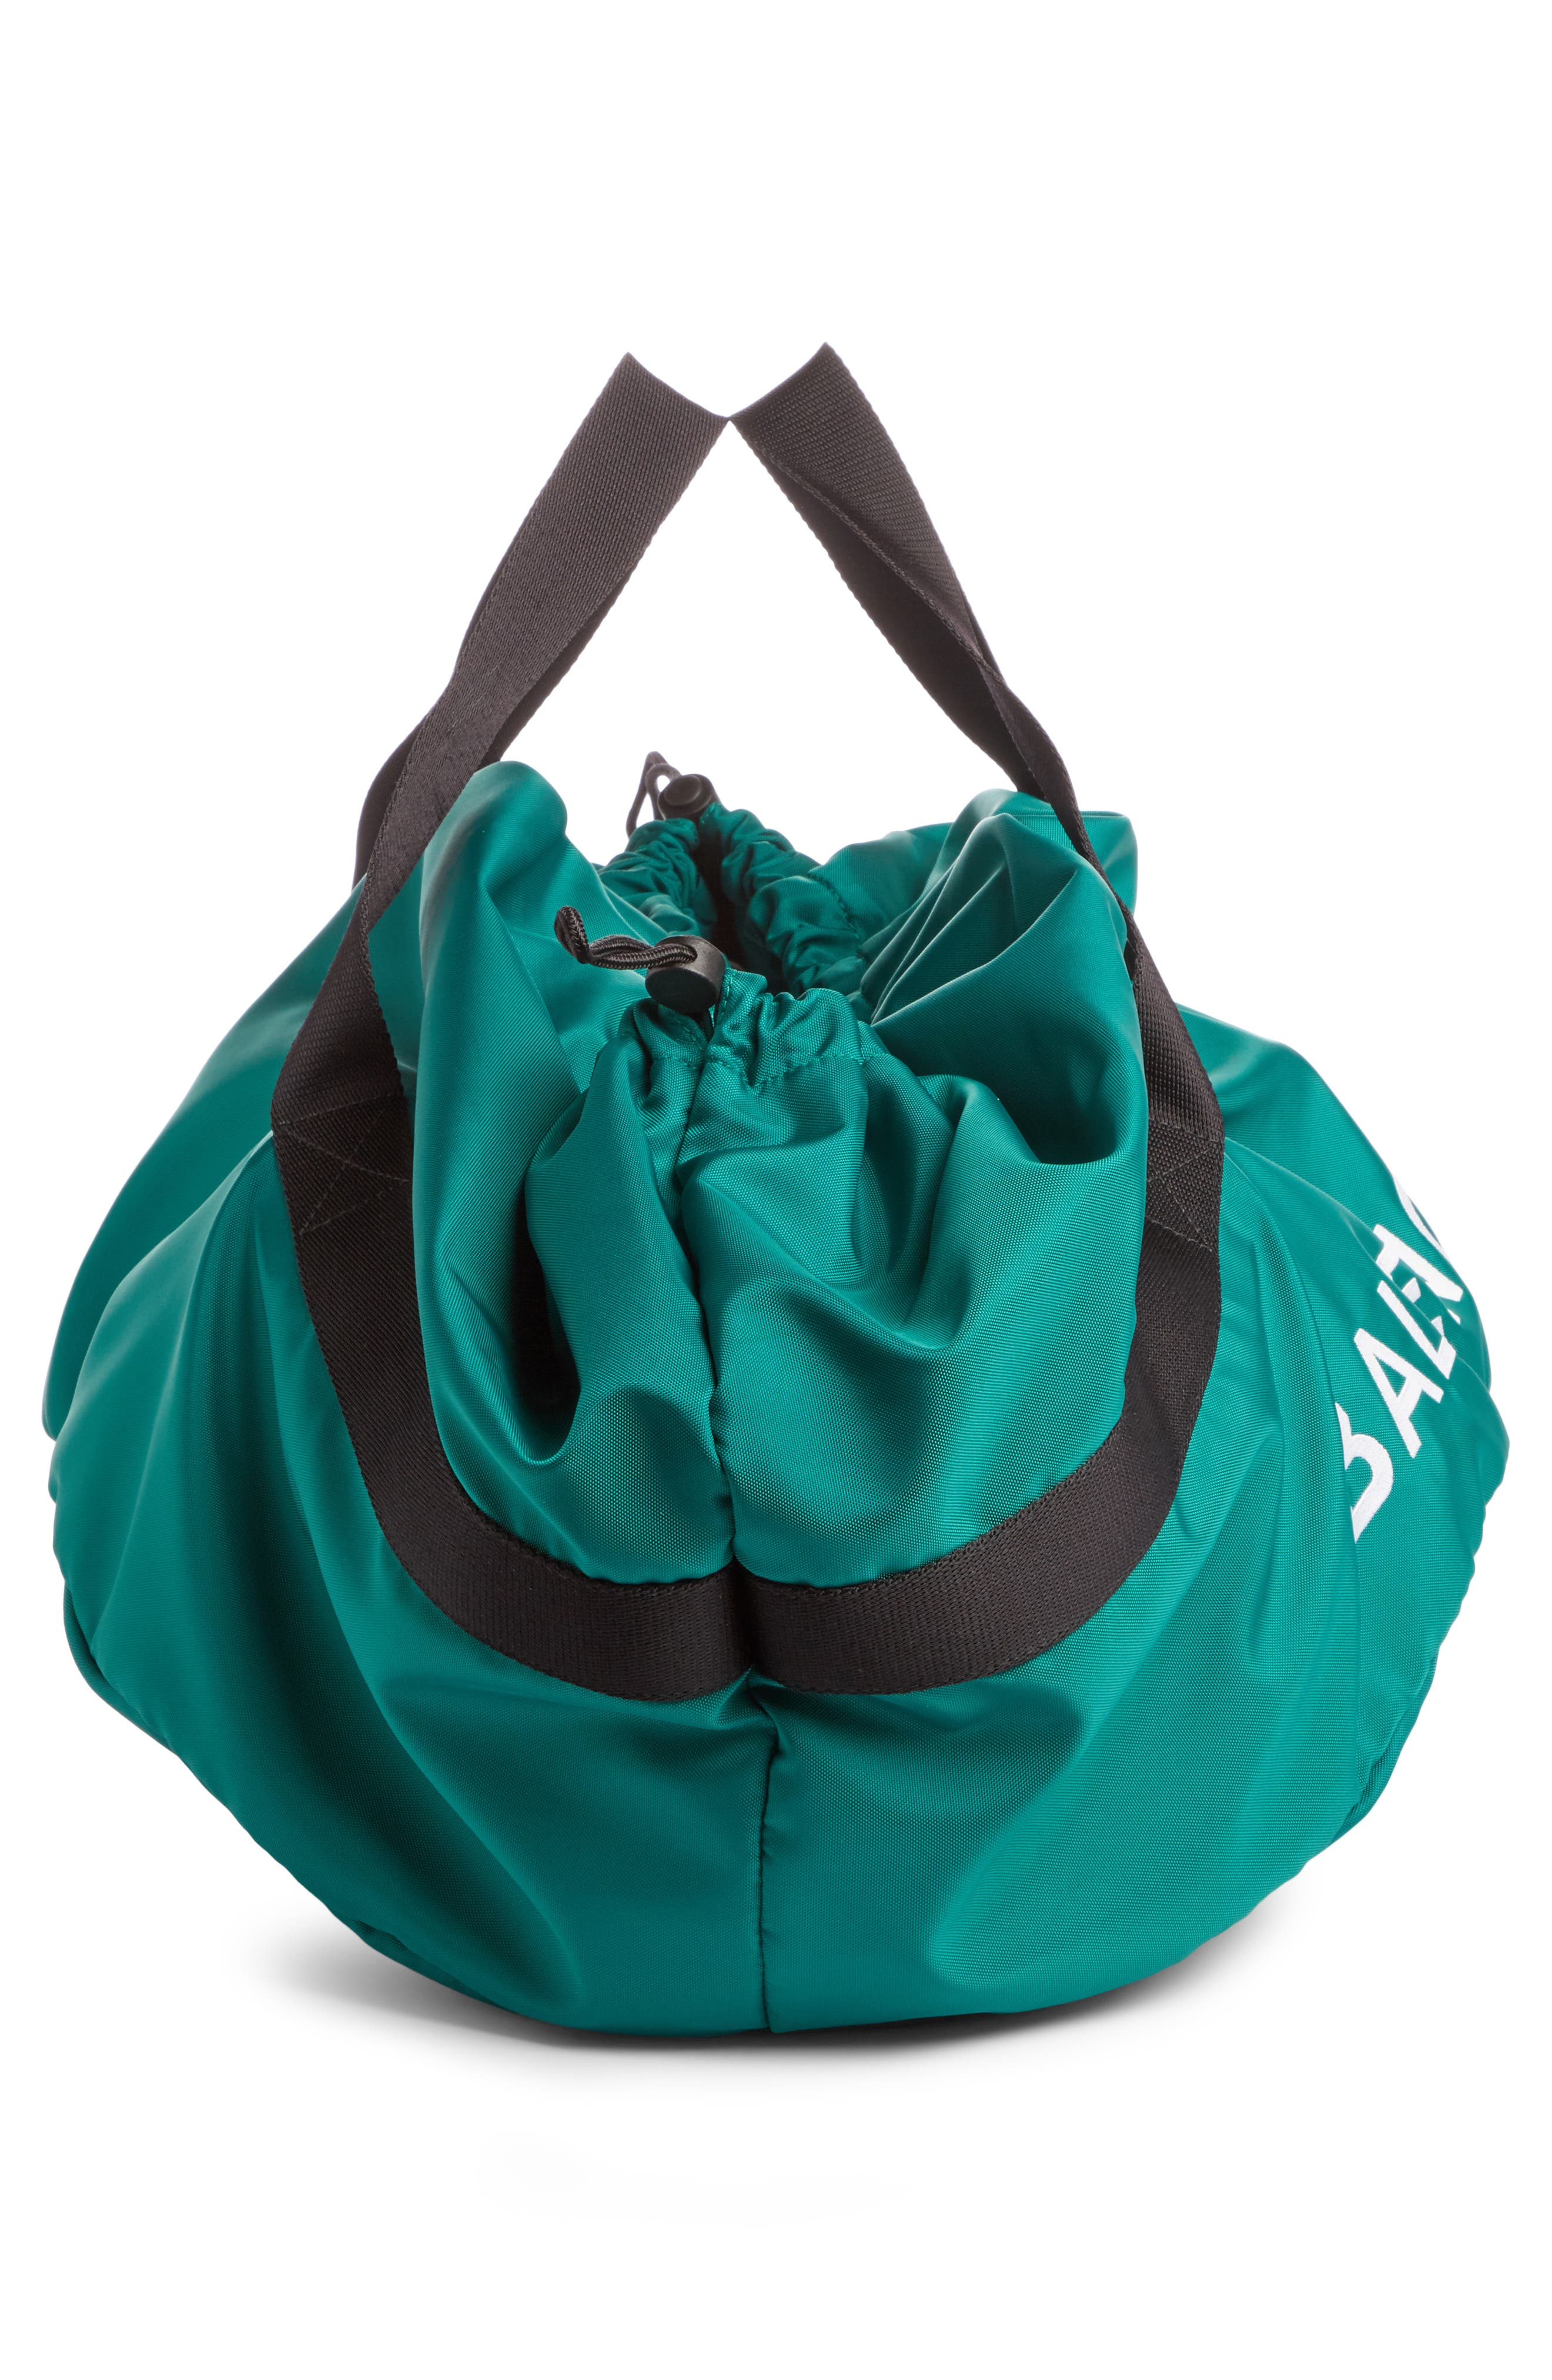 Small Wheel Bag,                             Alternate thumbnail 3, color,                             Vert Emeraude/ Noir